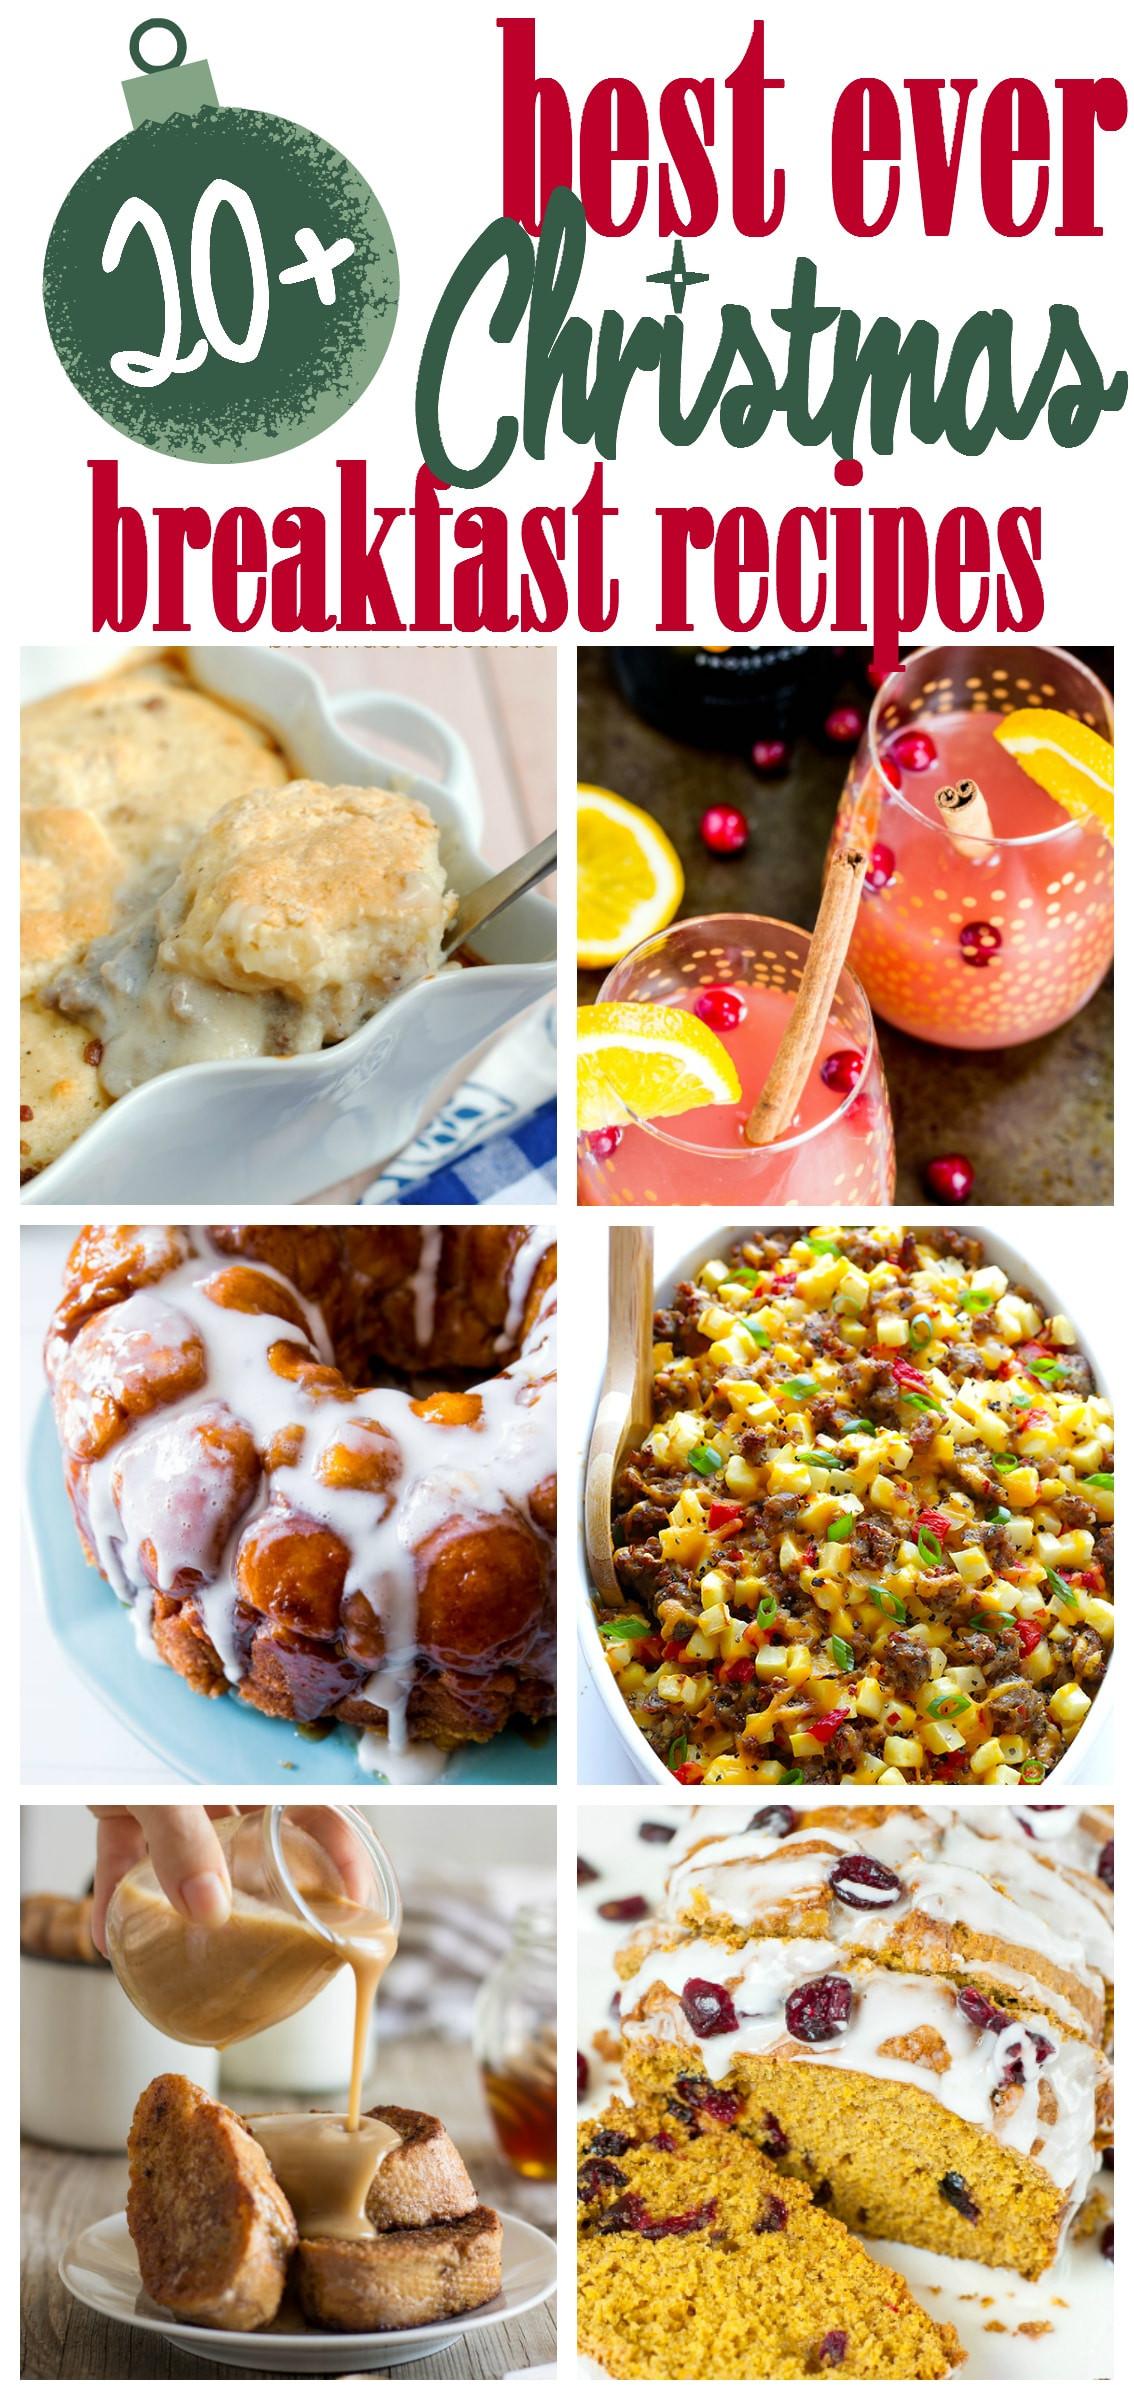 Christmas Breakfast Recipes  Best Christmas Breakfast Recipes Kim s Cravings